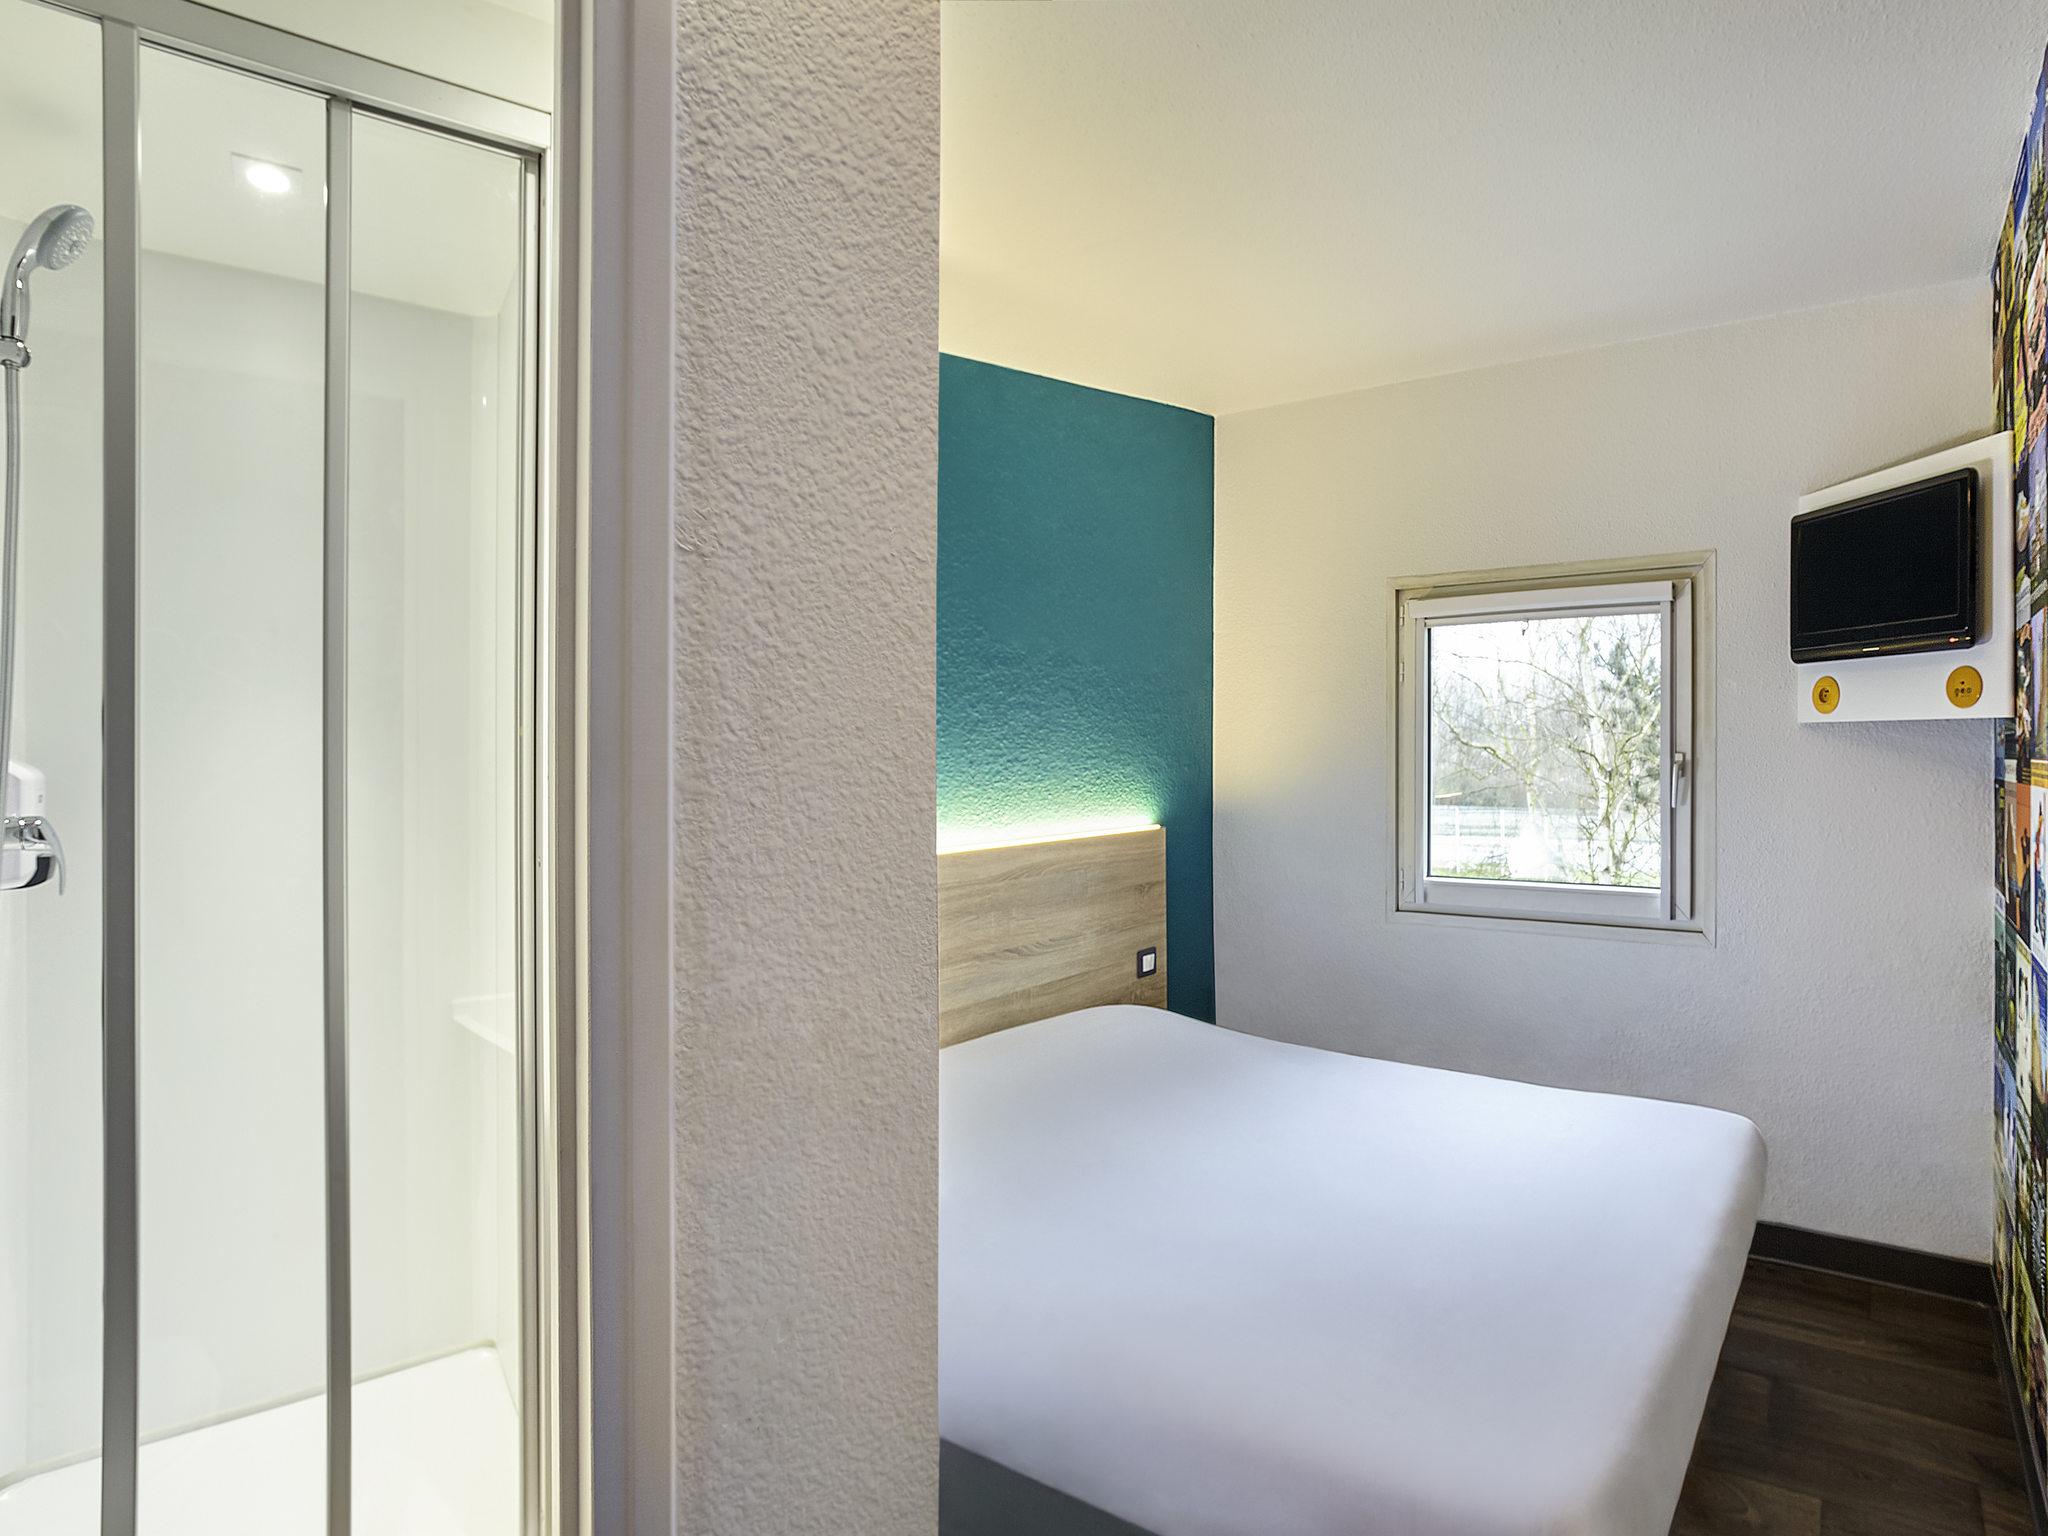 Отель — hotelF1 Nice Villeneuve-Loubet (rénové)